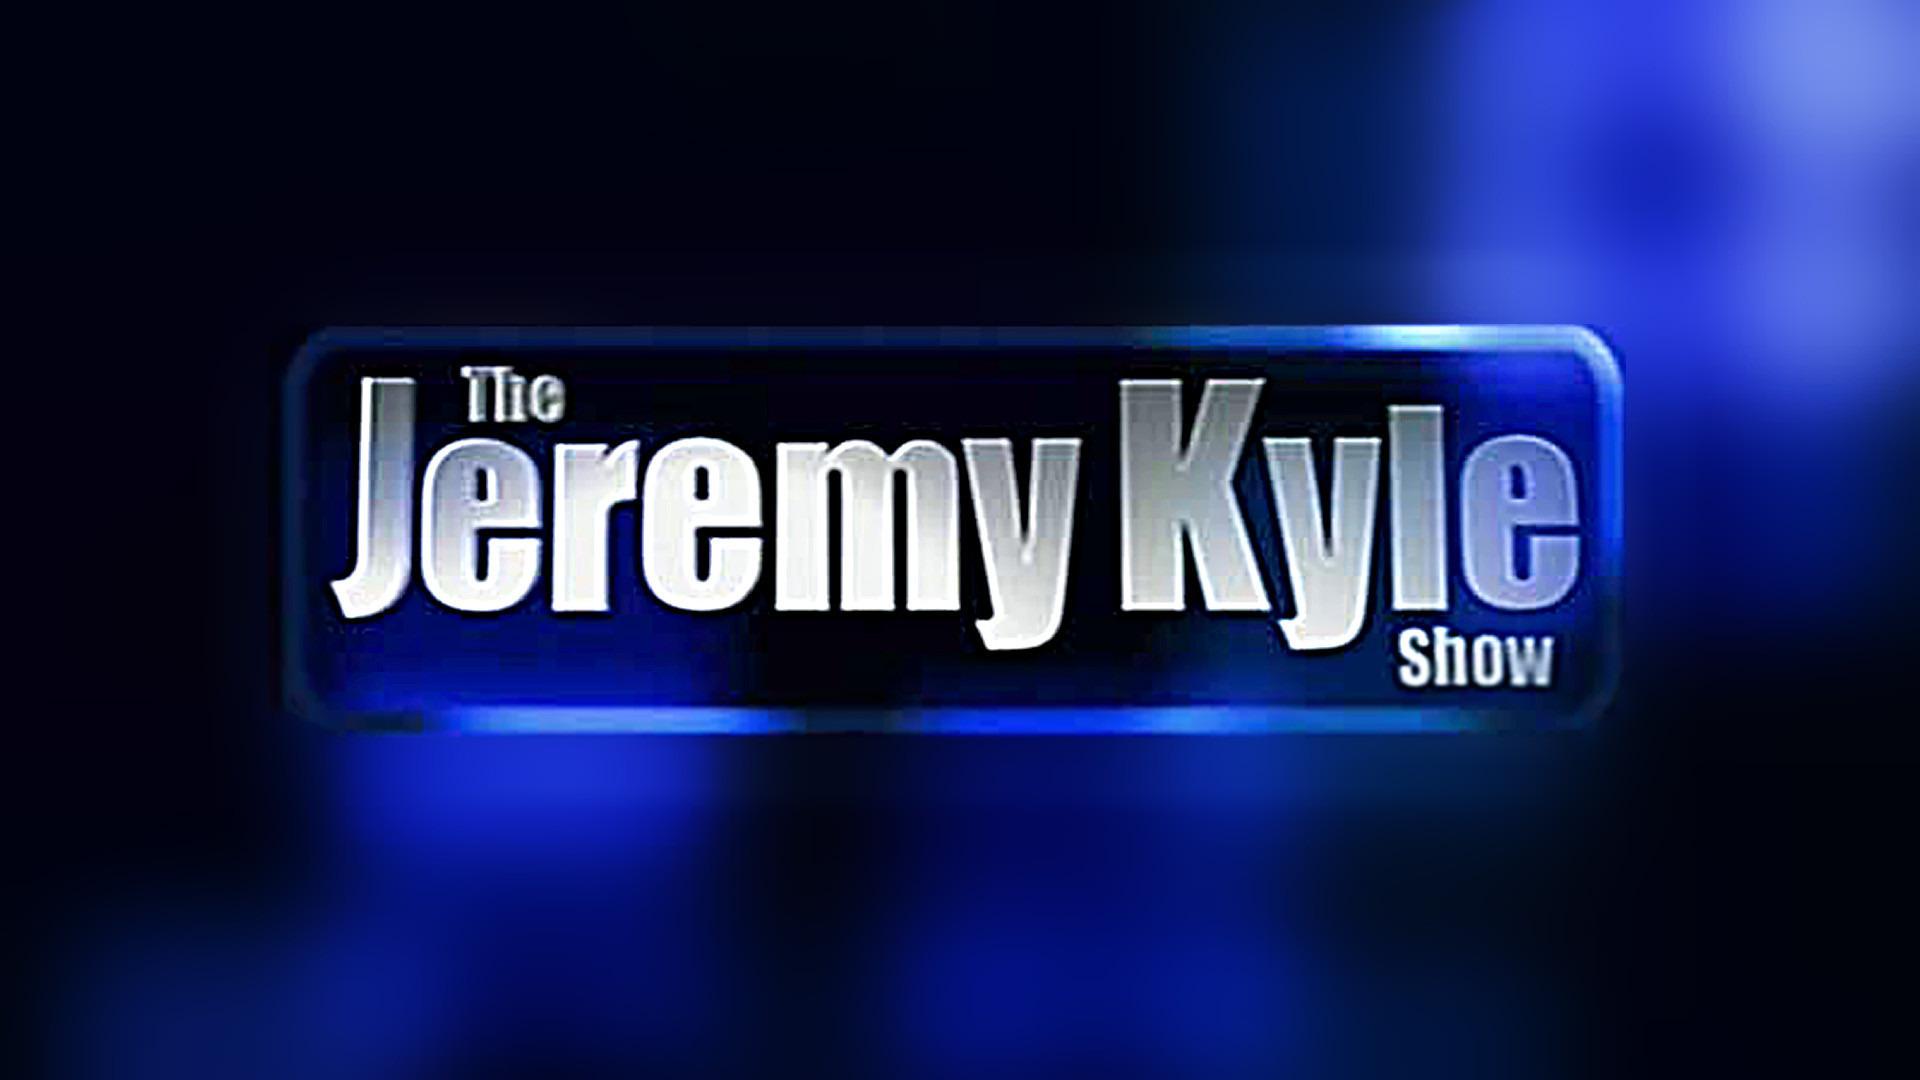 Show The Jeremy Kyle Show